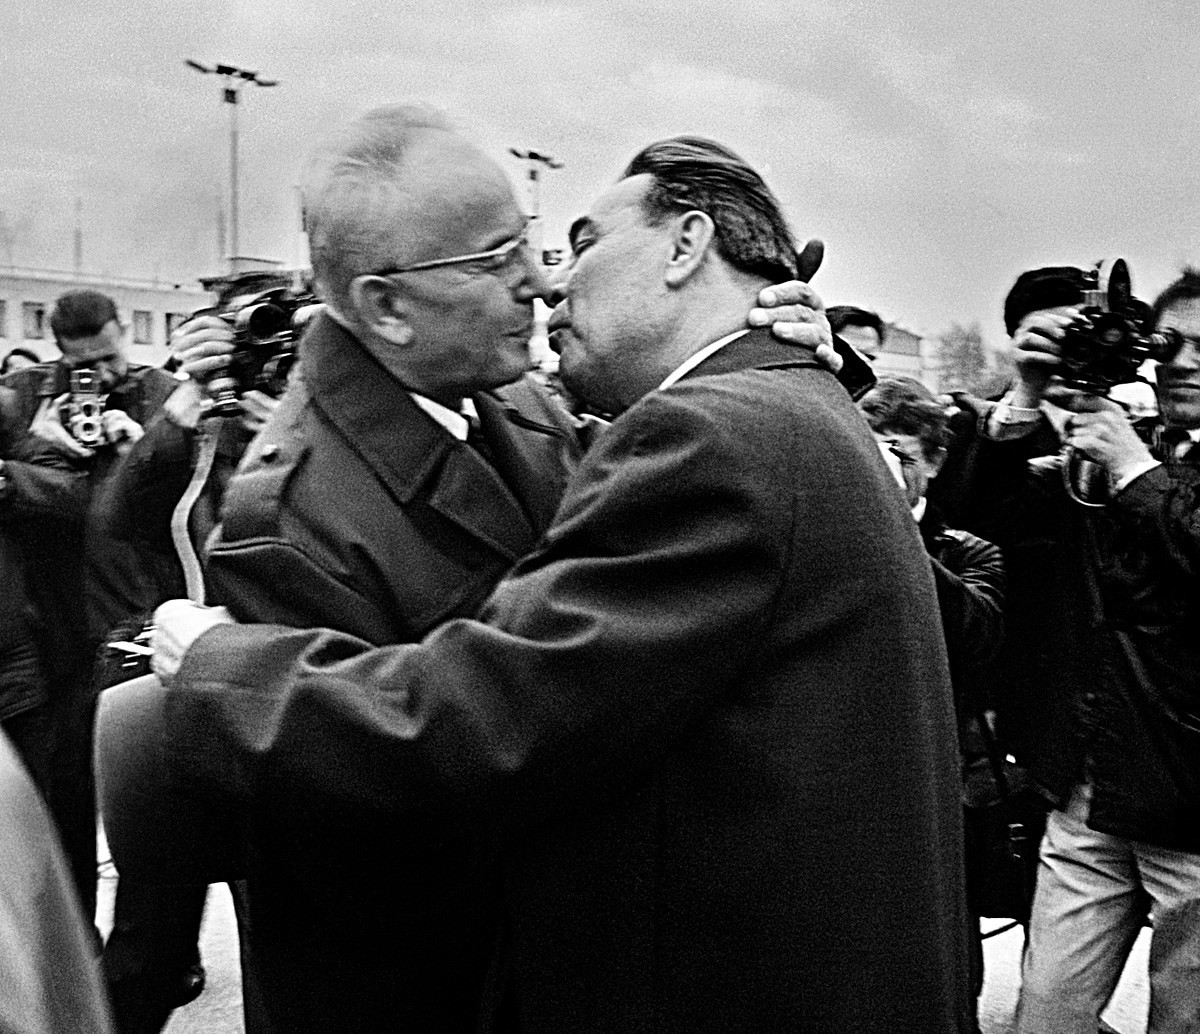 Ciuman antara Pemimpin Partai Cekoslowakia dan Soviet Gustav Husak (kiri) dan Leonid Brezhnev di Praha, 5 Mei 1970.